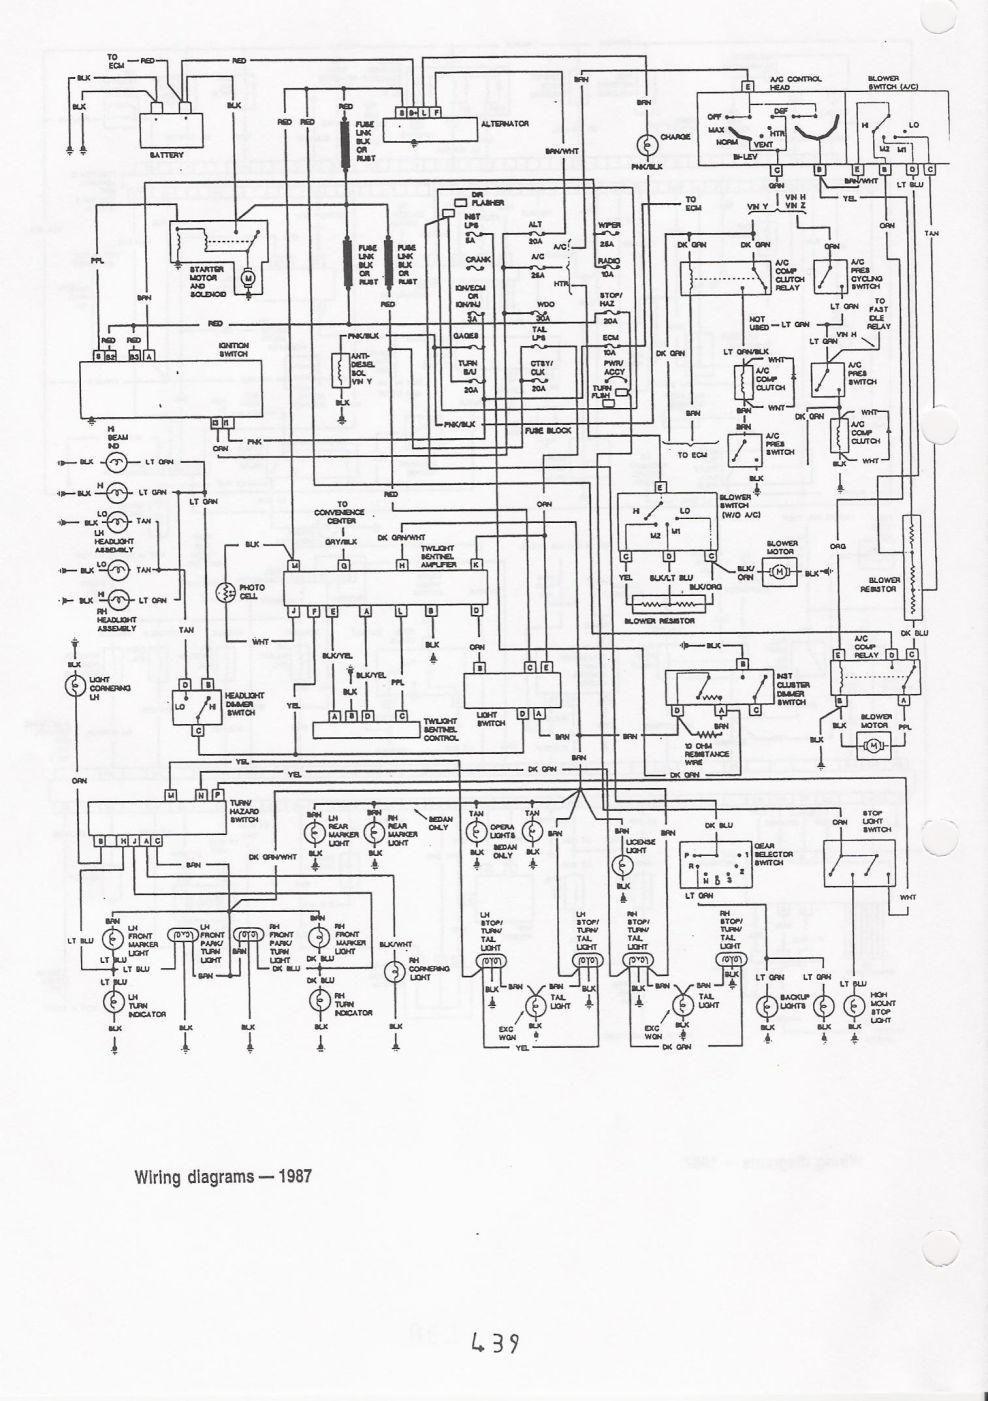 1987 caprice wiring diagrams